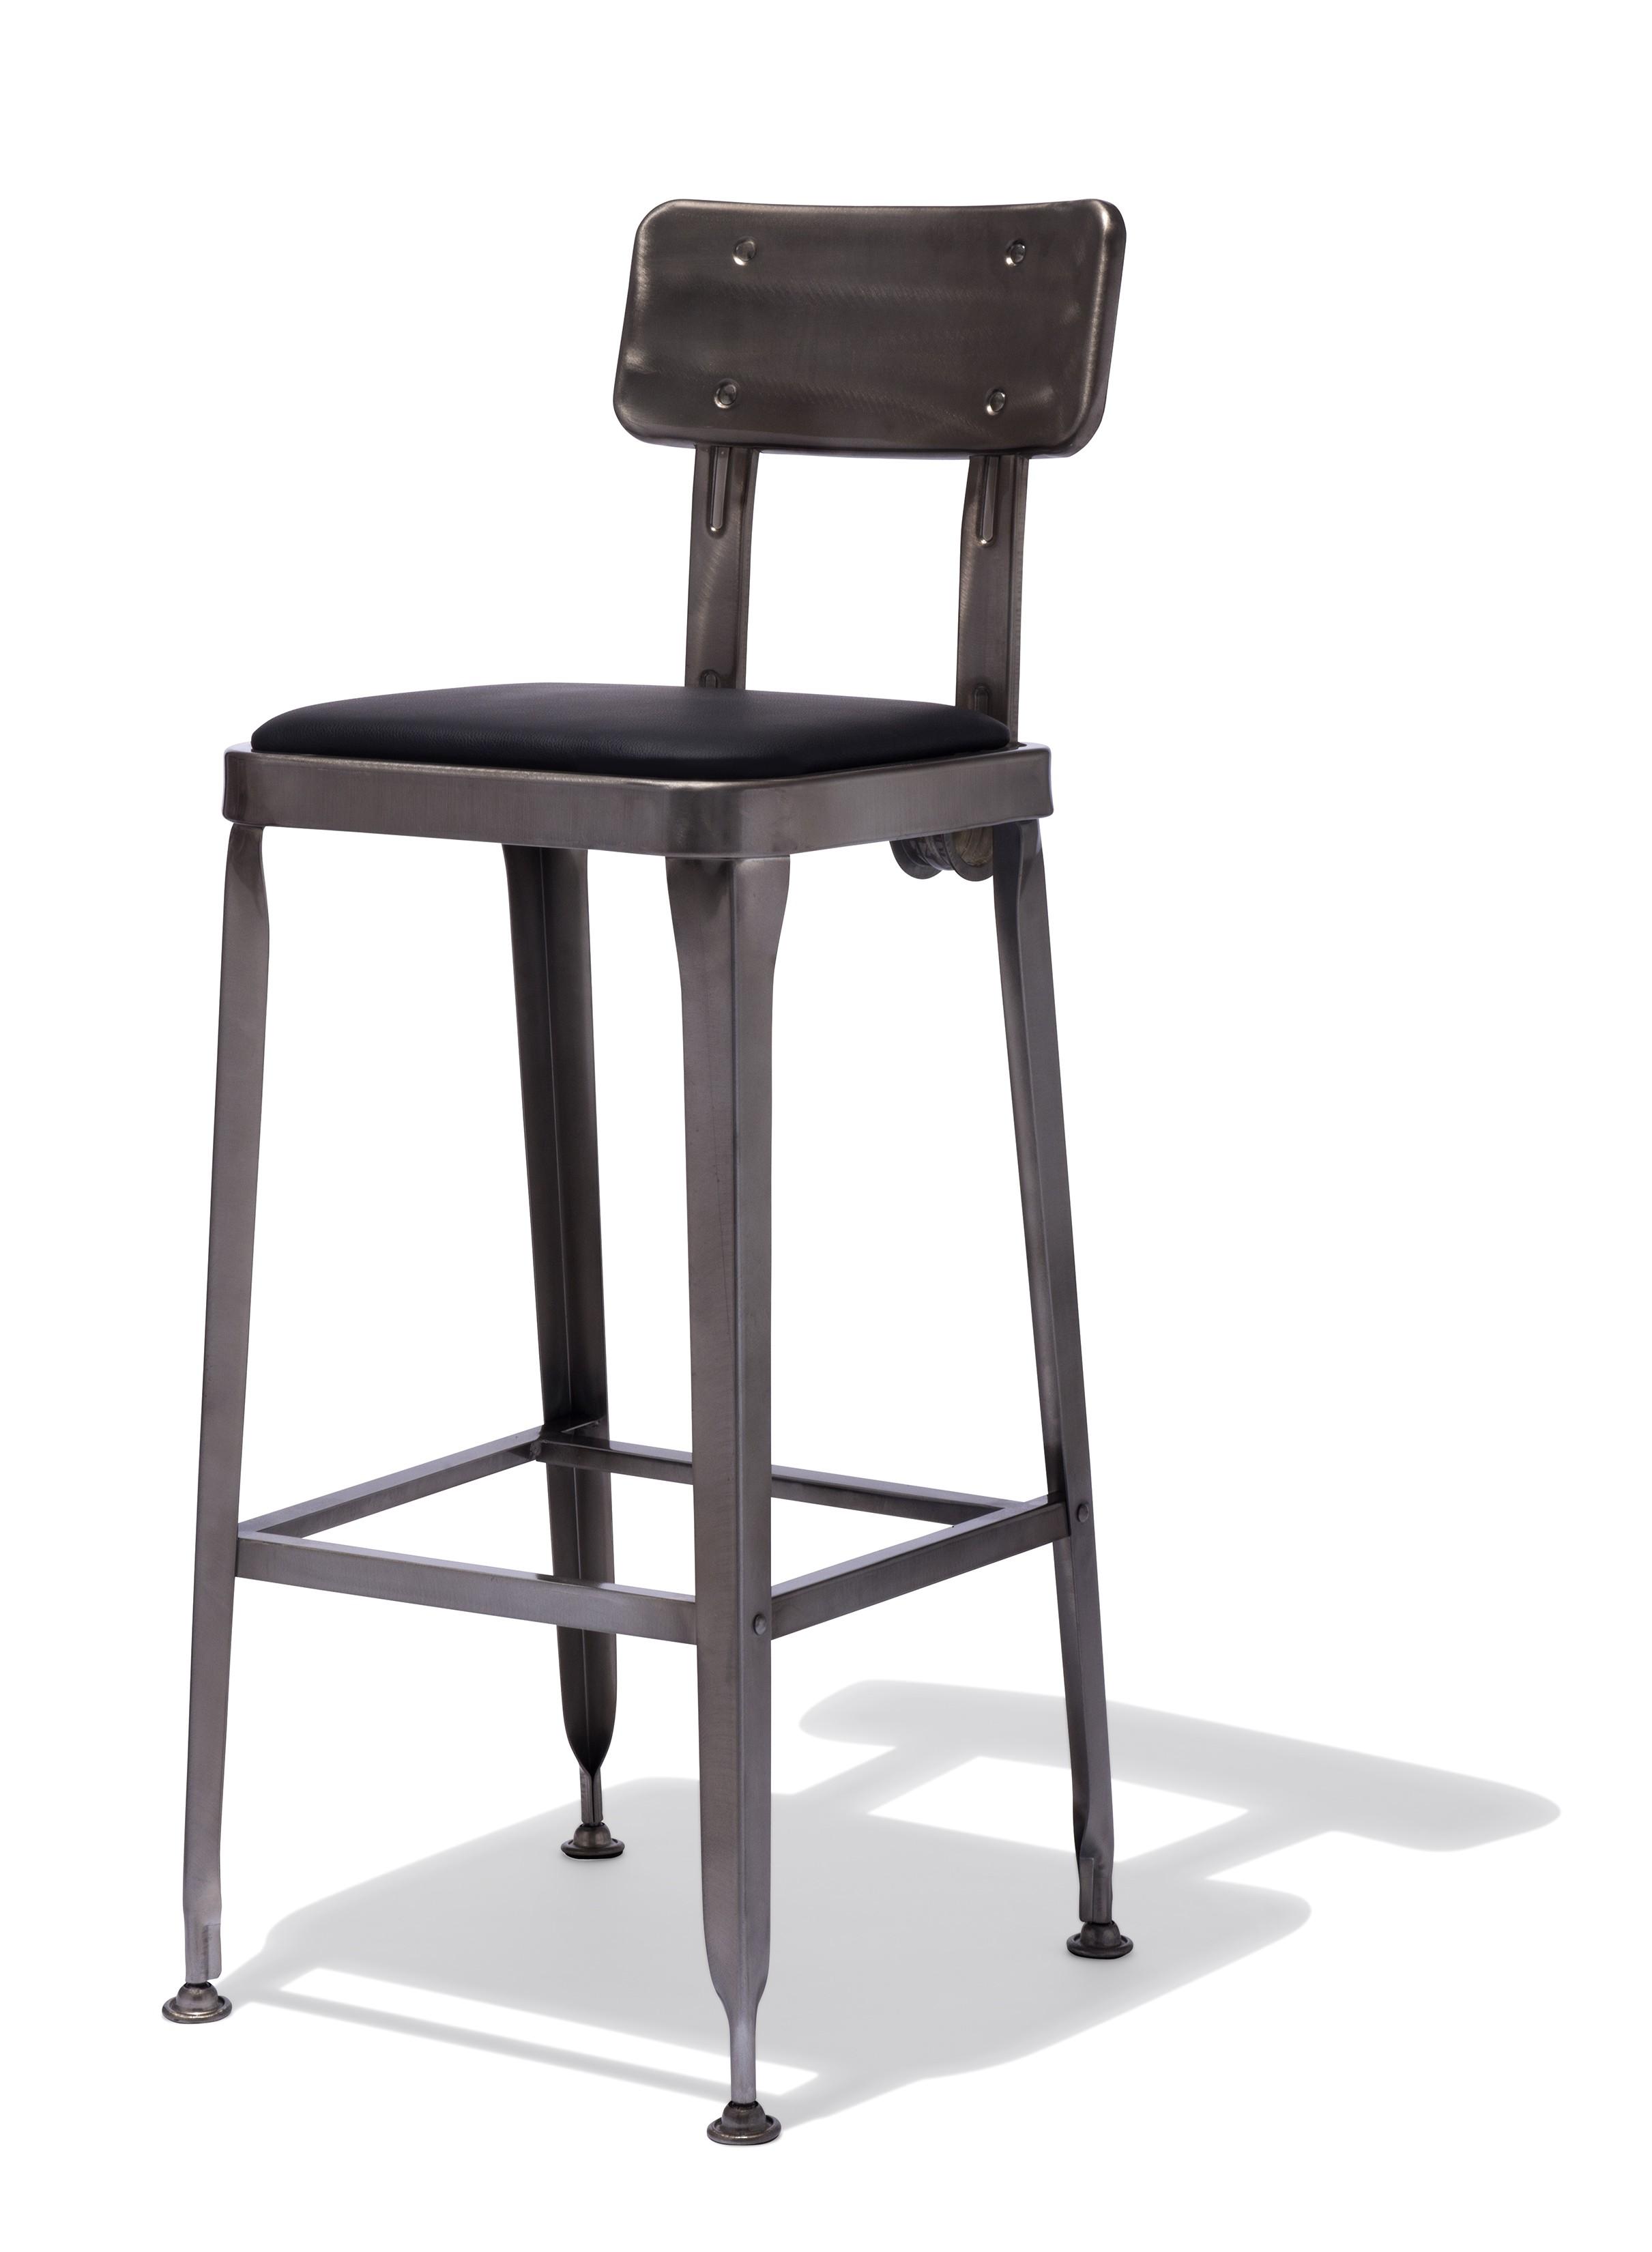 octane bar stool